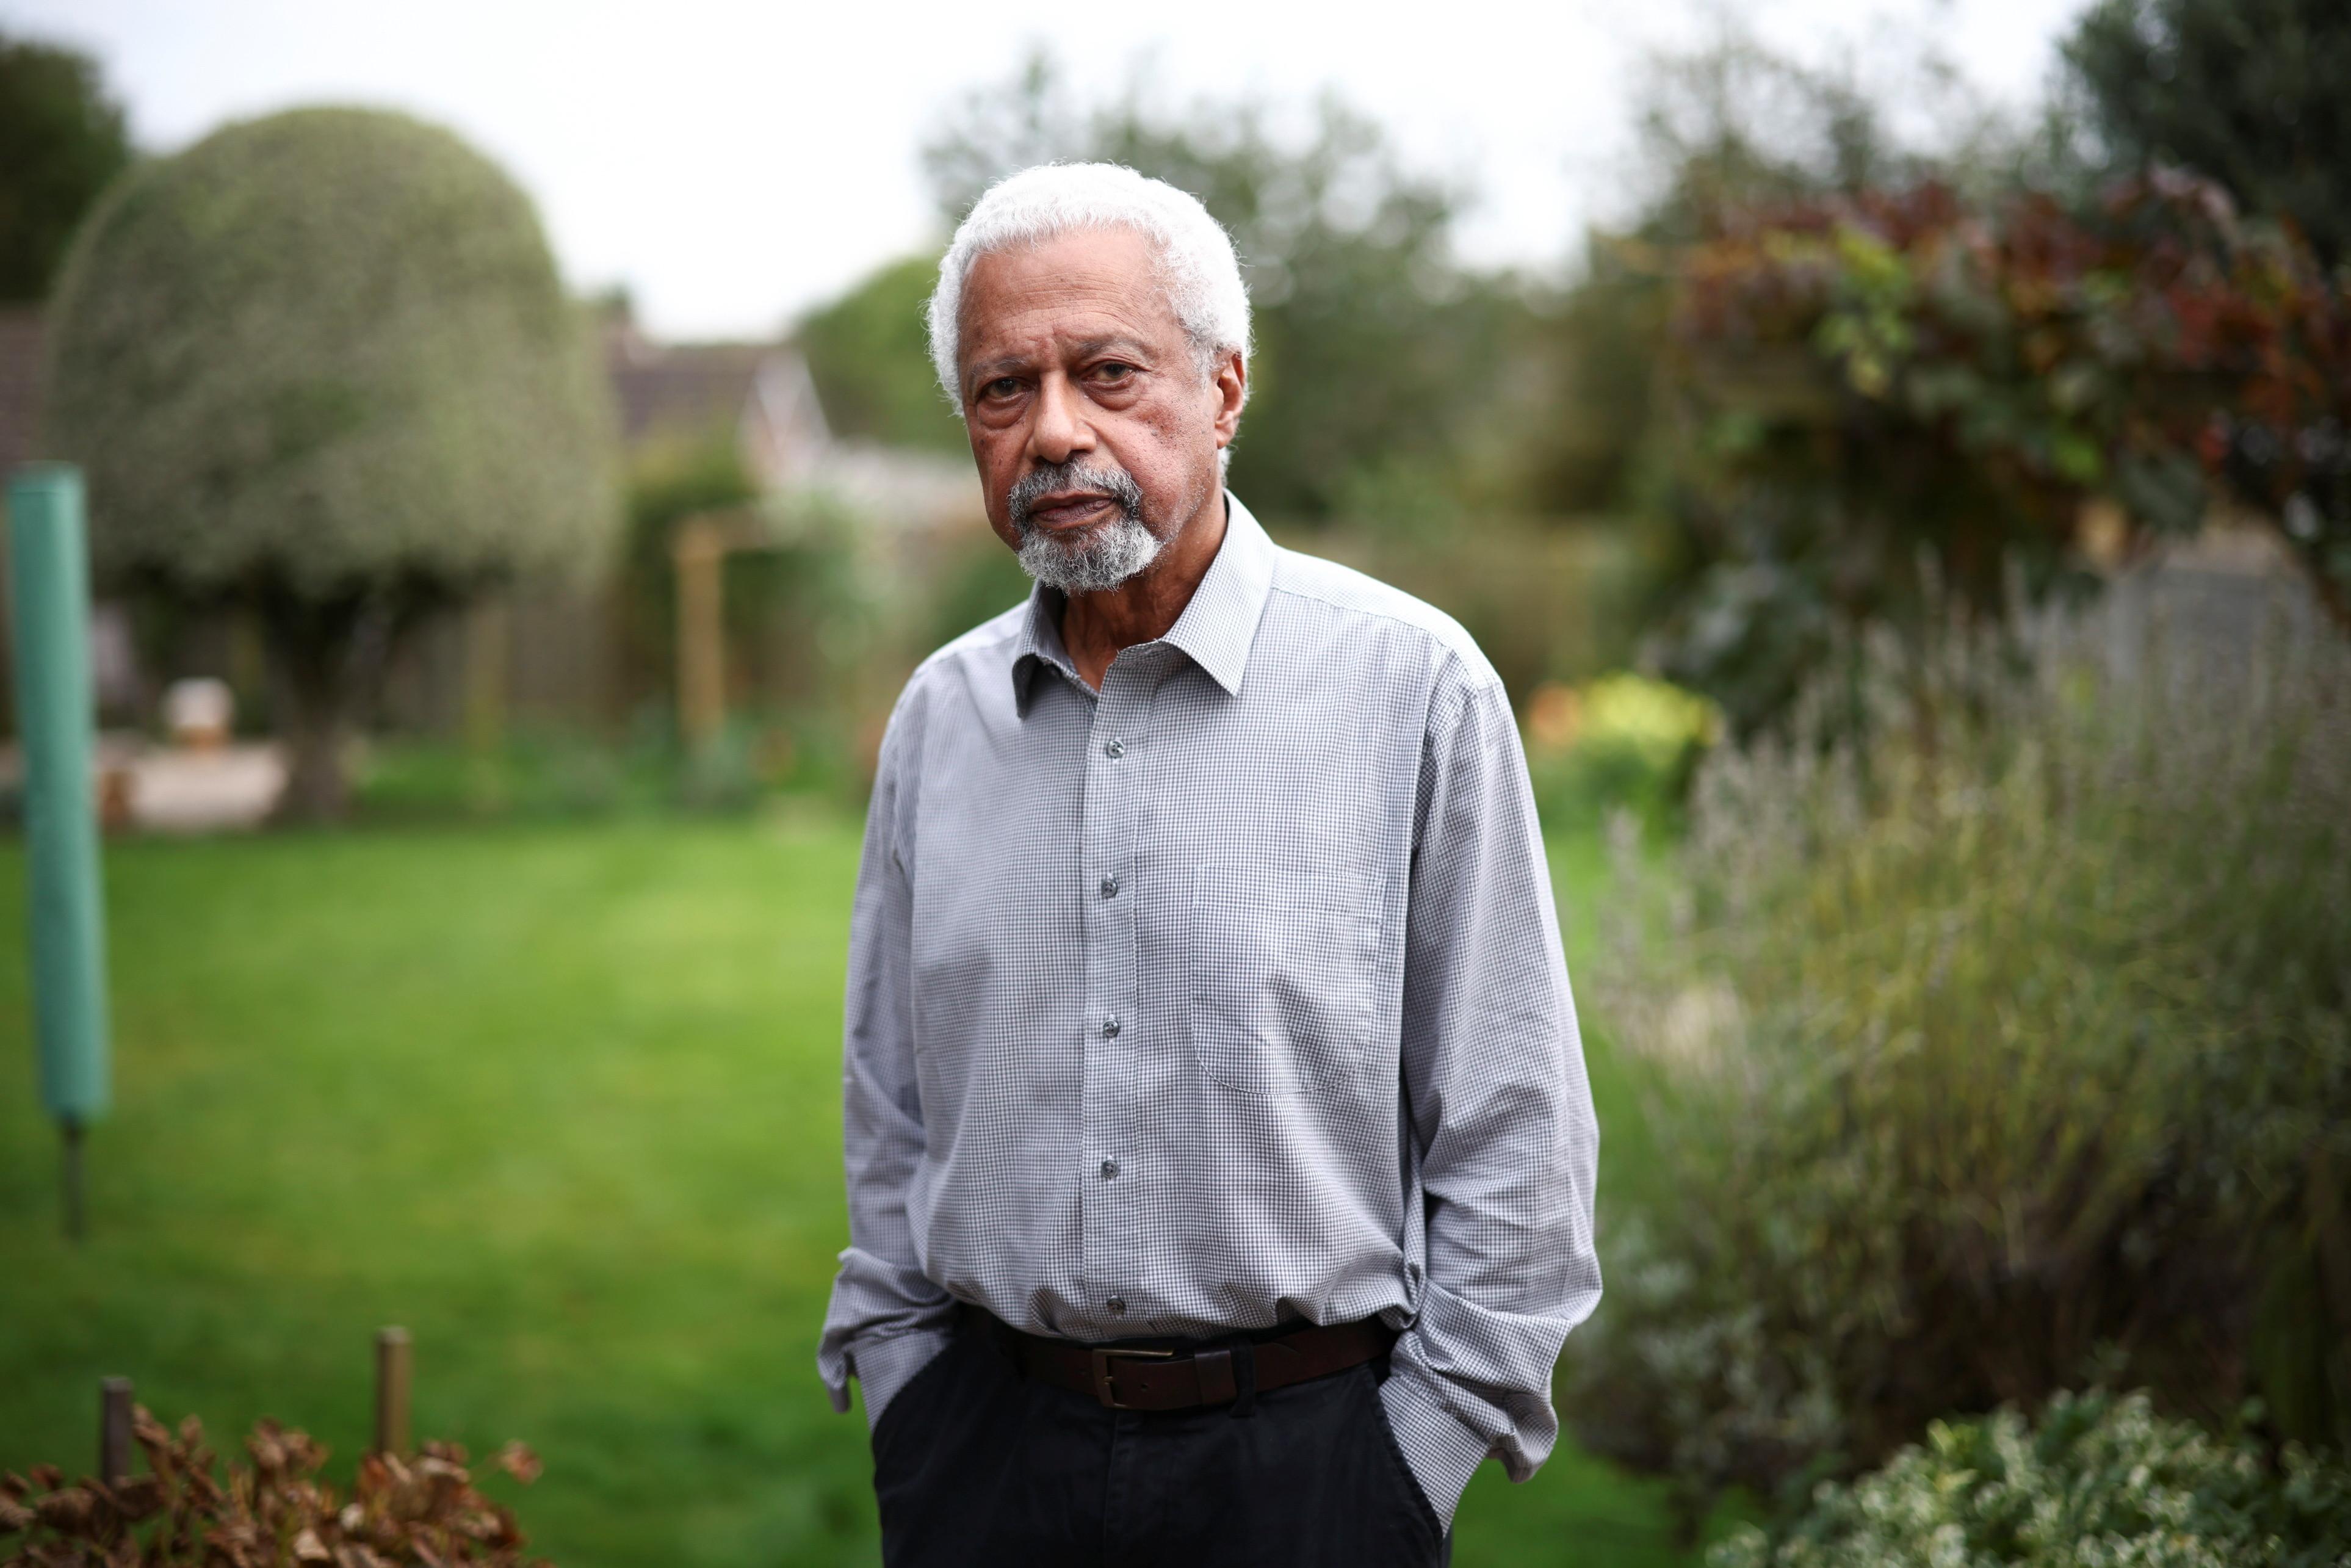 Tanzanian novelist Abdulrazak Gurnah, winner of the 2021 Nobel Prize for Literature, poses at his home in Canterbury, Britain, October 7, 2021